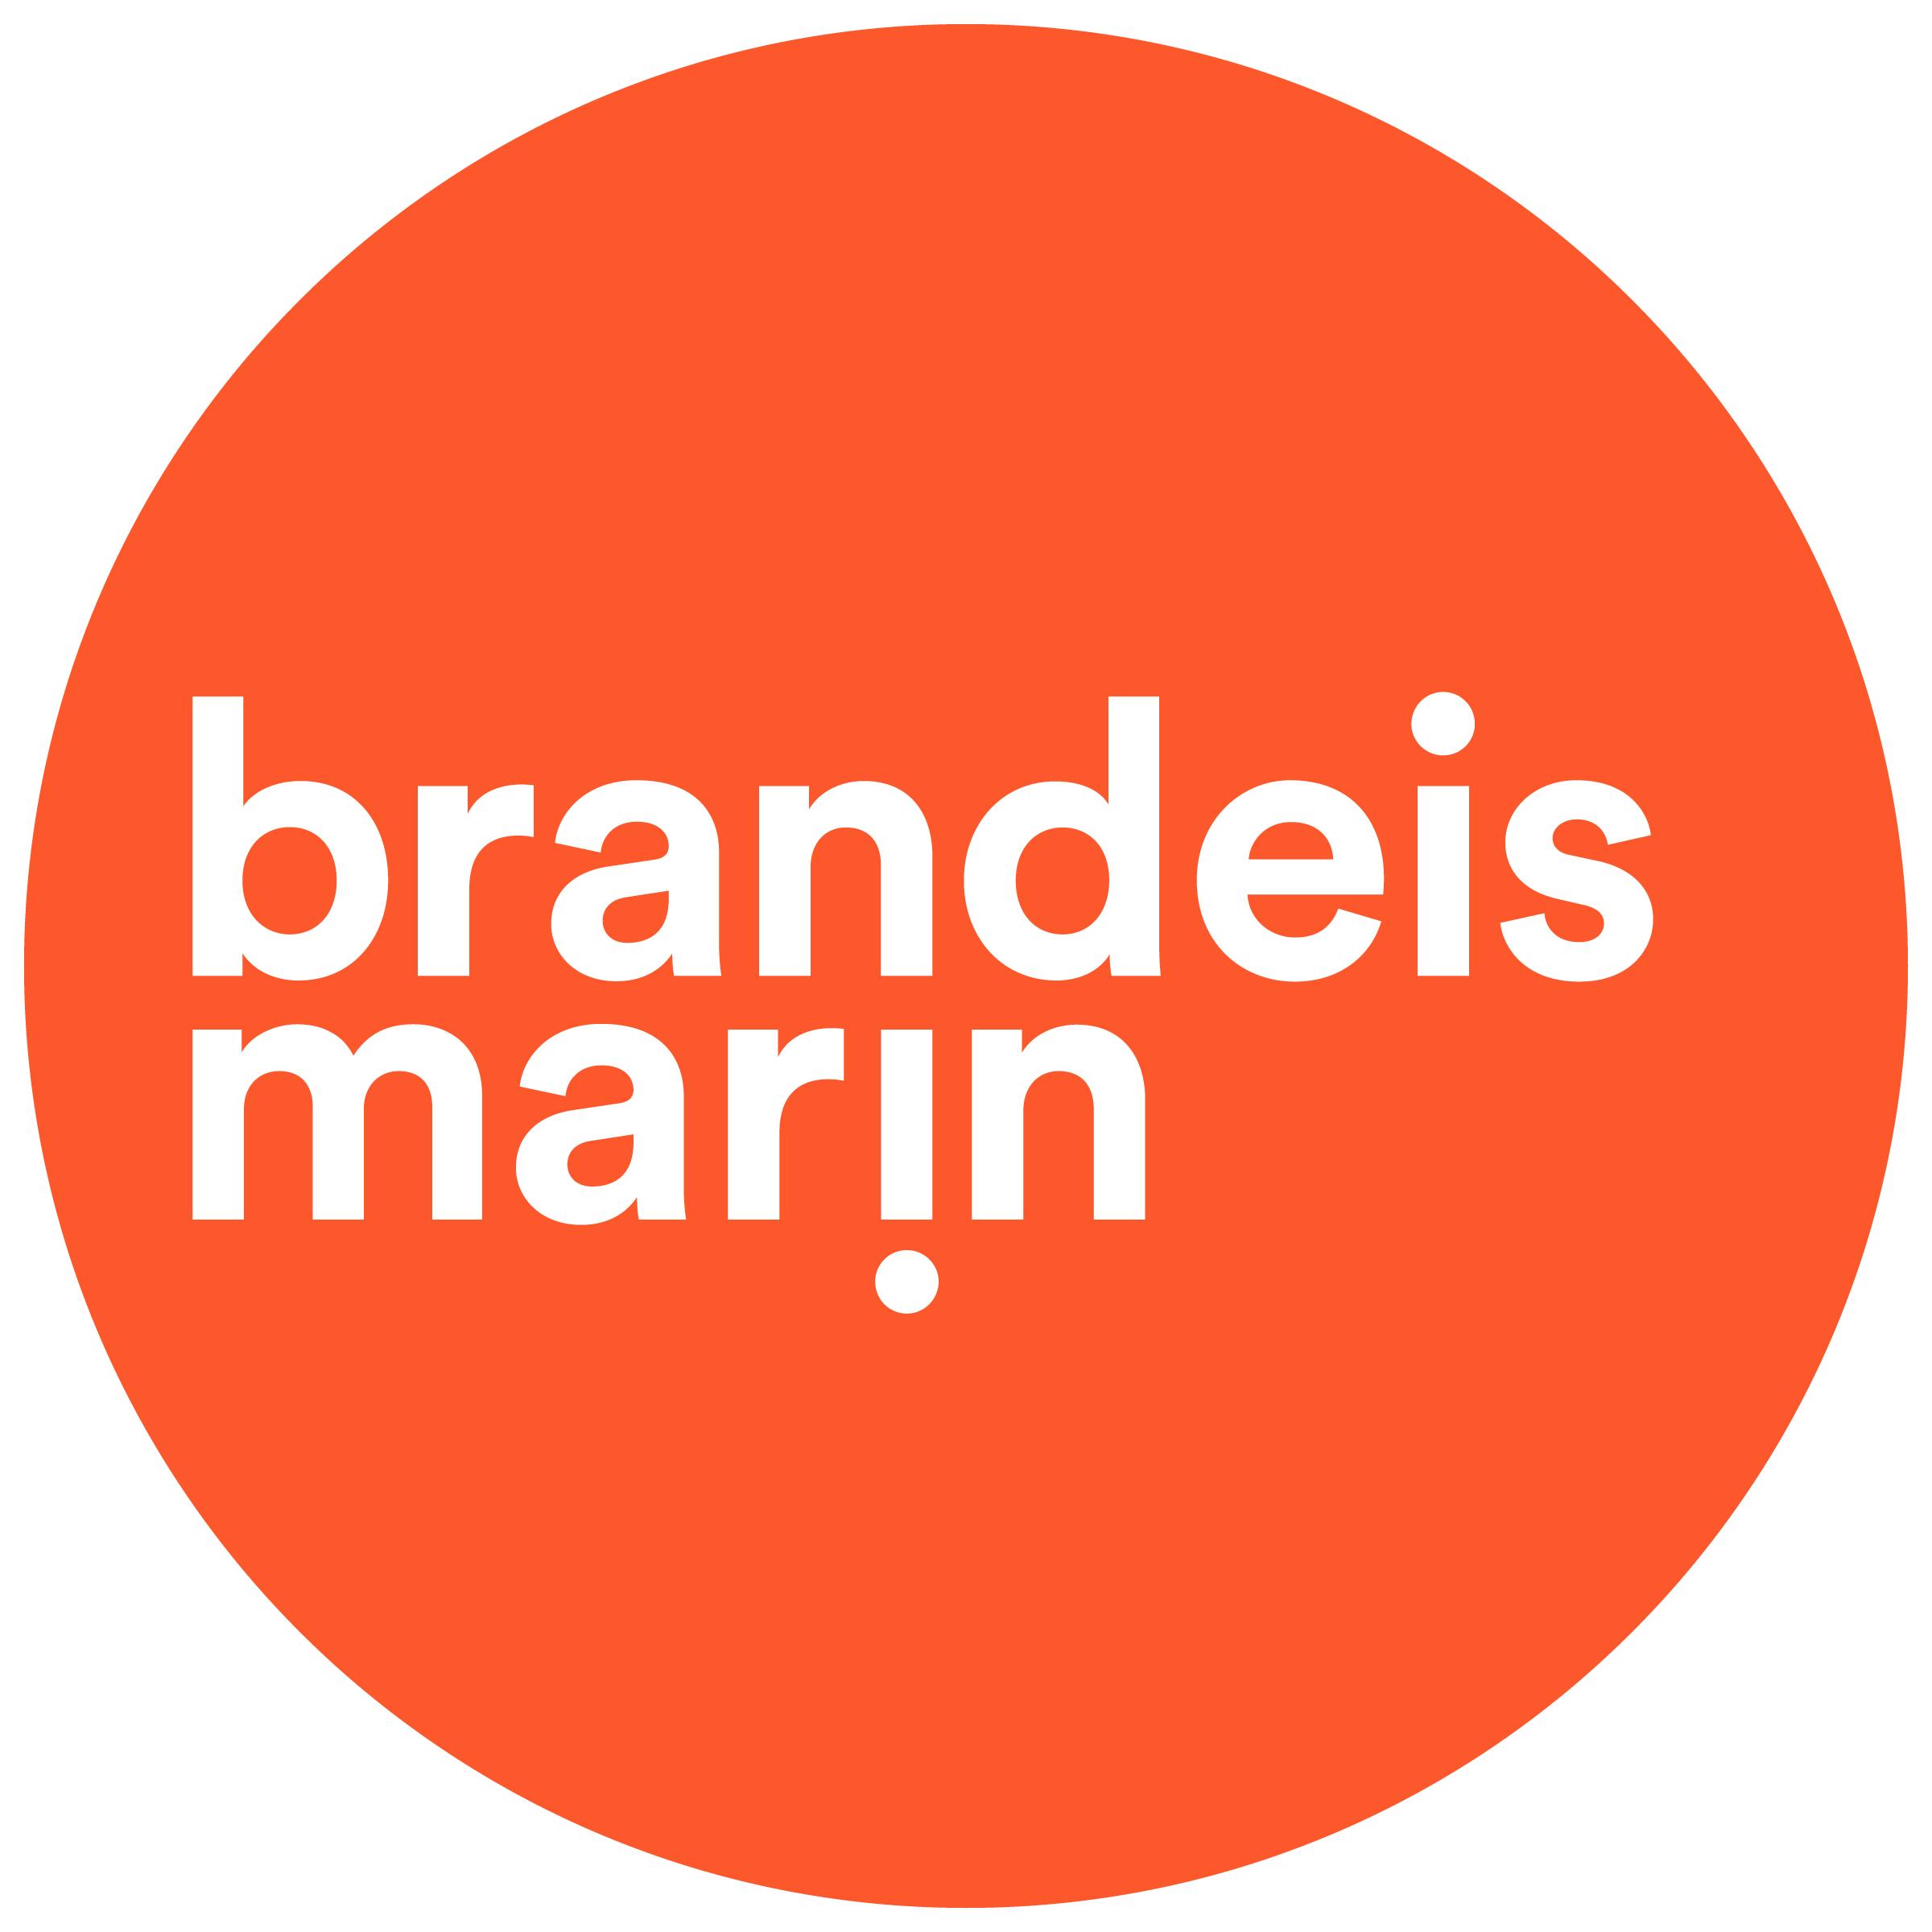 Brandeis Marin